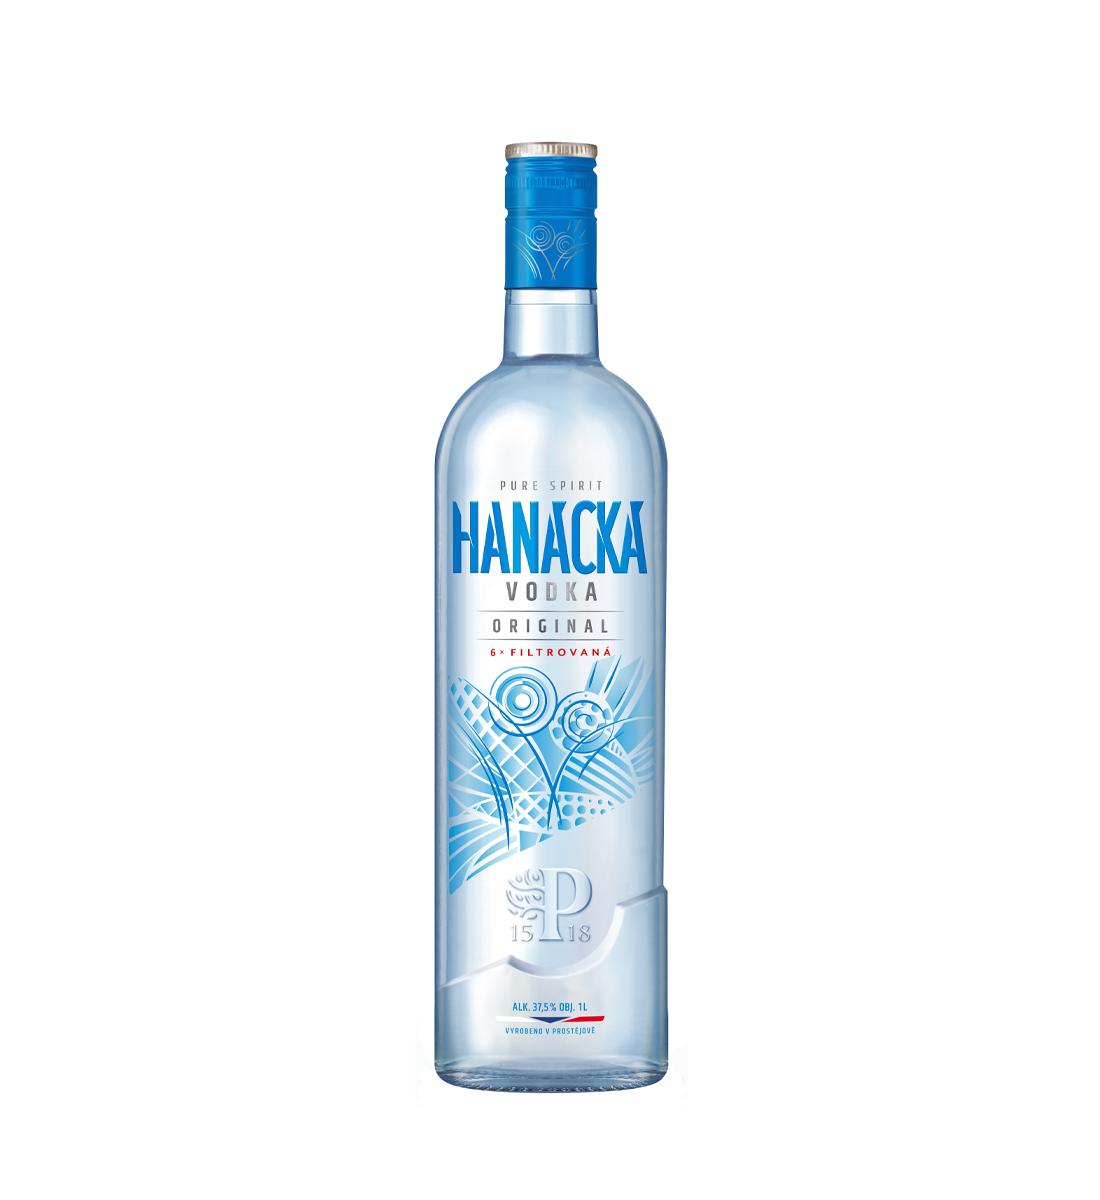 Hanacka Pure Spirit 1L